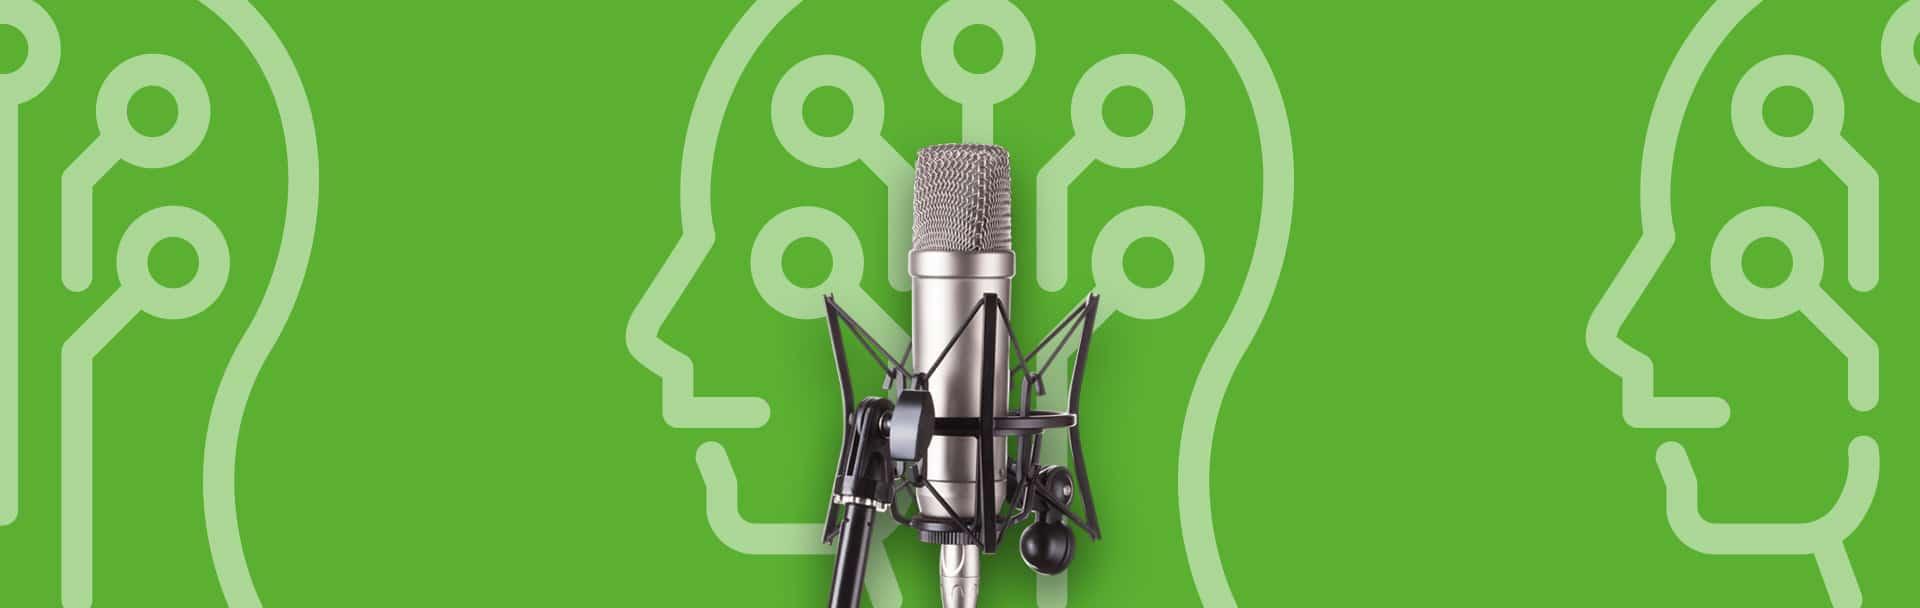 Podcast: Fraudedetectie – de use cases en algoritmes - Hot ITem